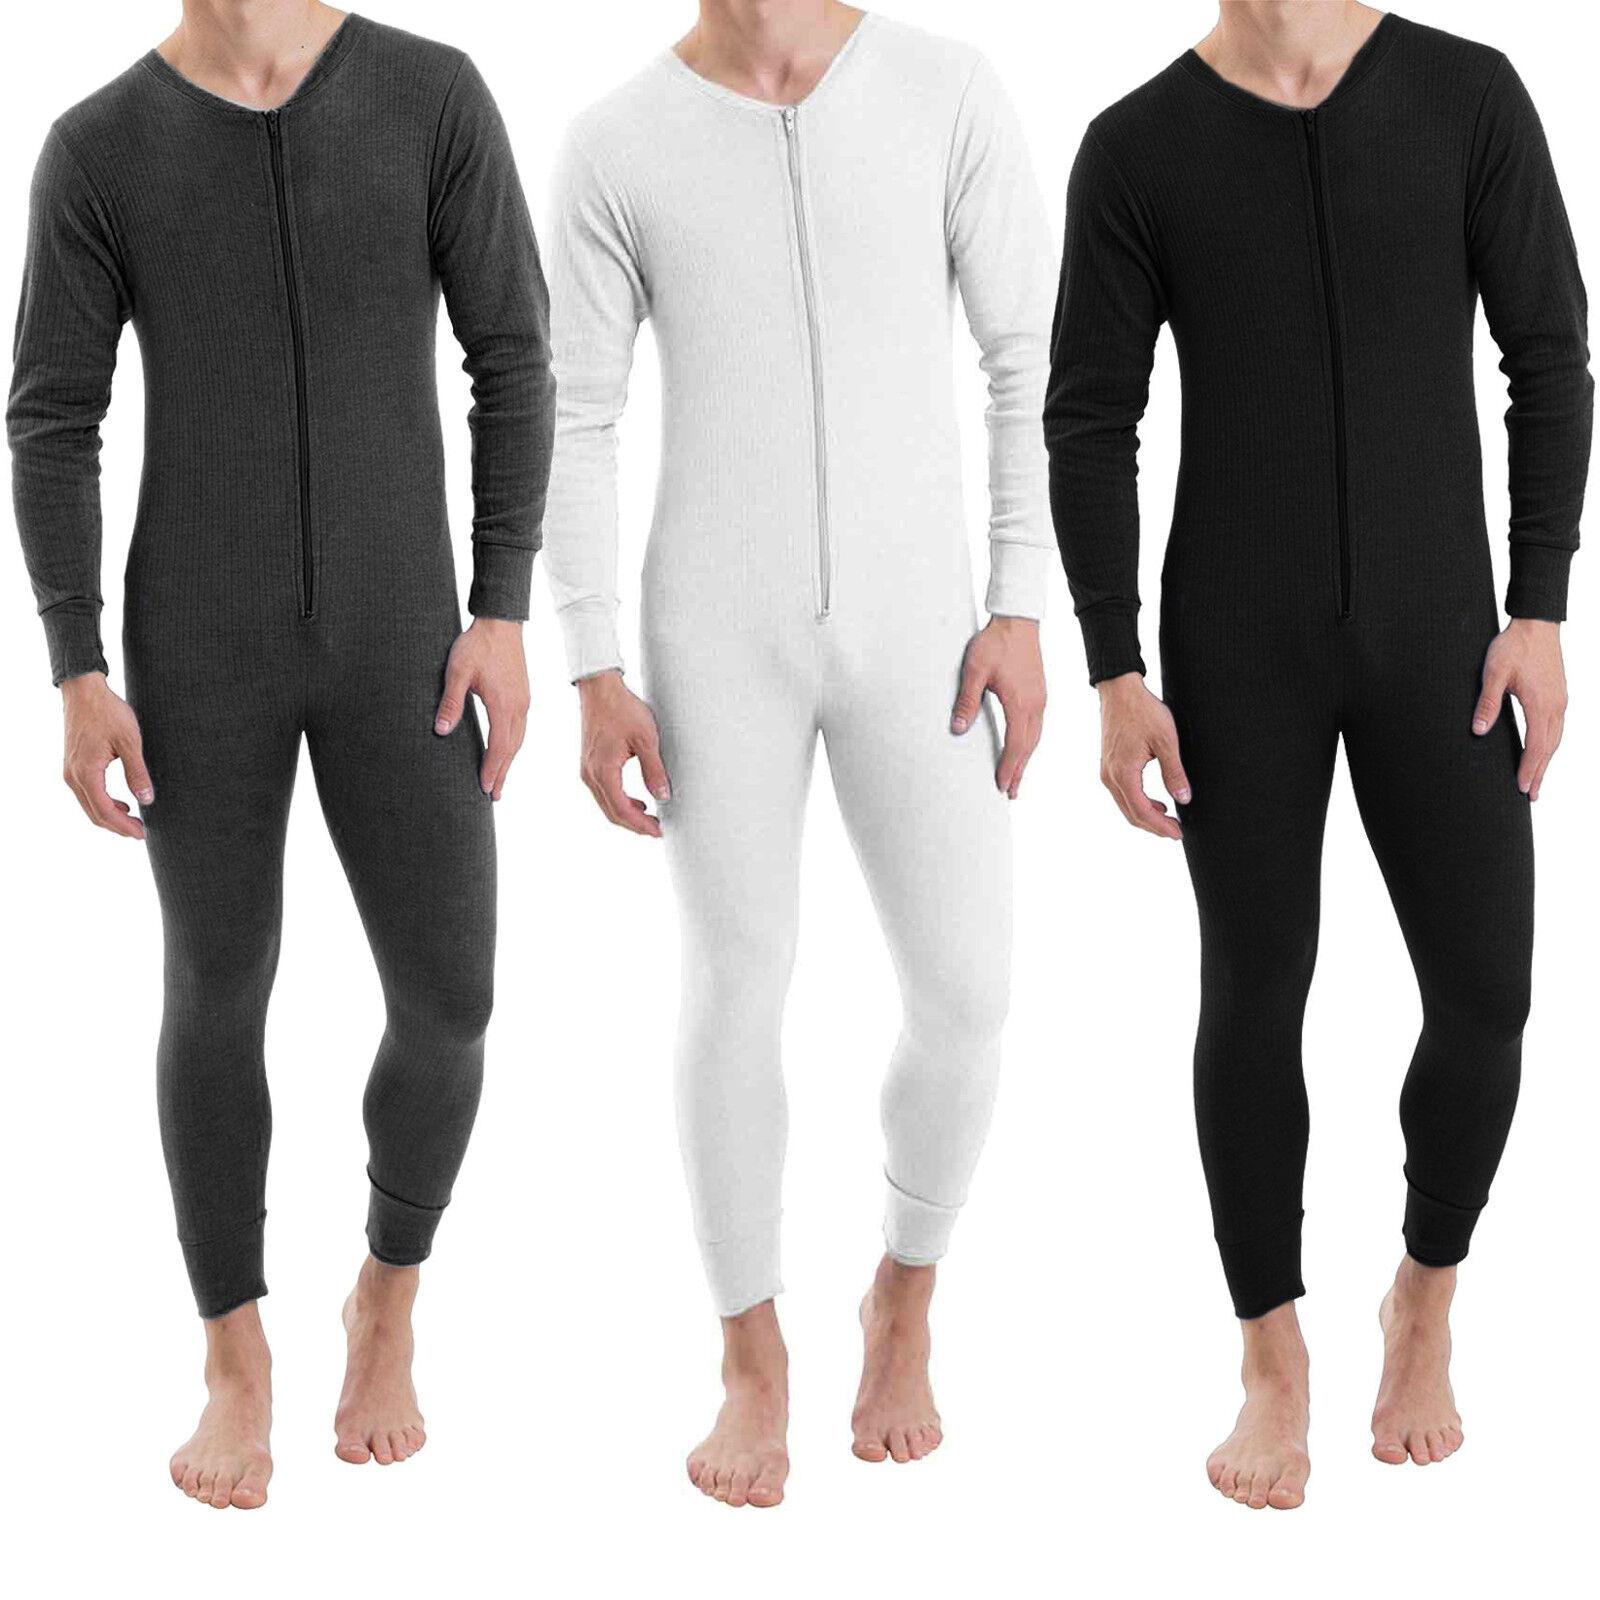 Men's Thermal All In One Onesee Bodysuit Jumpsuit Zip Baselayer Winter Ski S-2XL